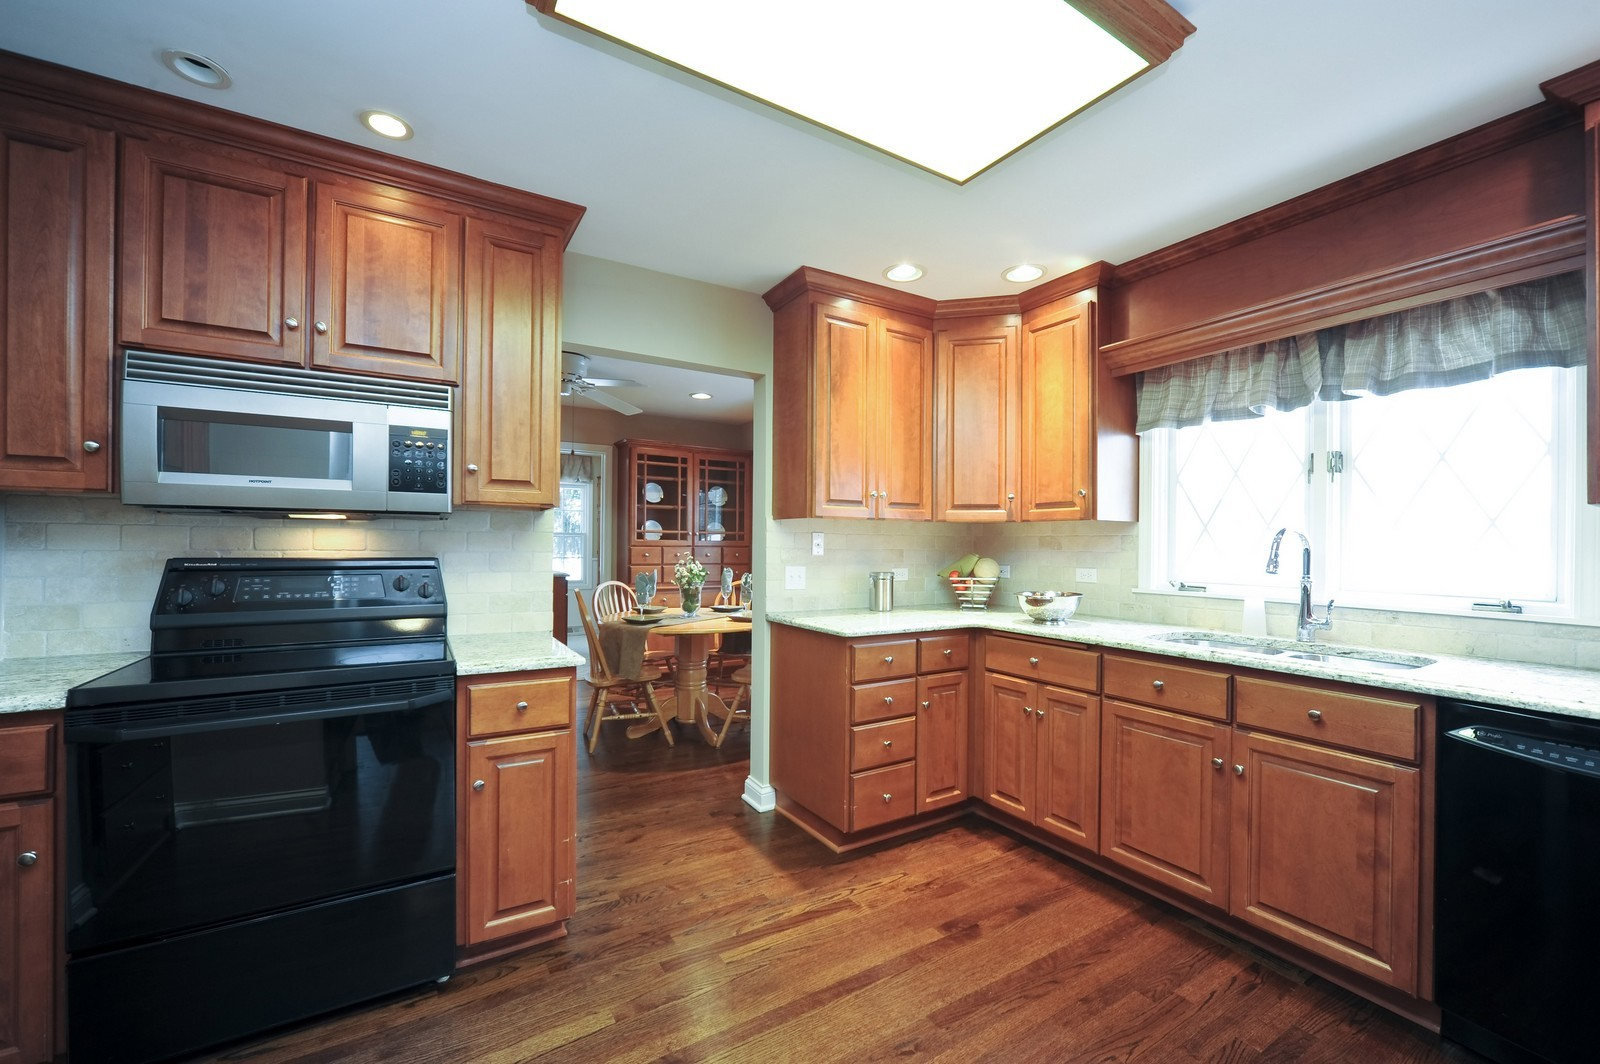 Real Estate Photography - 251 Grandview Ave., Glen Ellyn, IL, 60137 - Kitchen / Breakfast Room